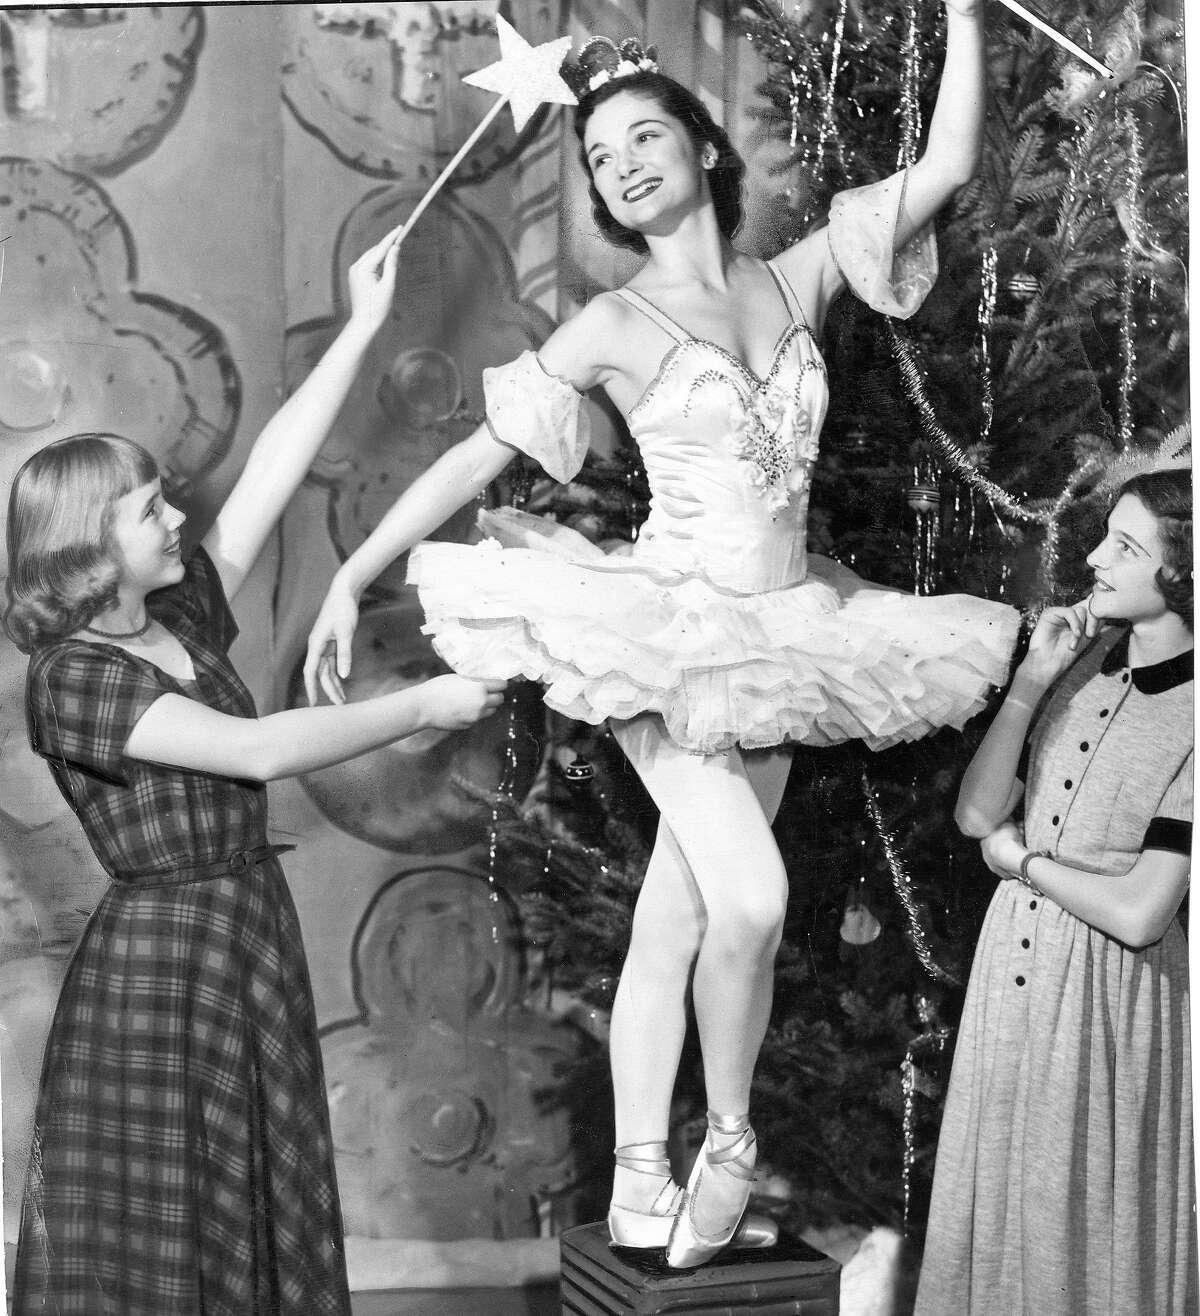 Carla Raven , Jocelyn Vollmar, and Mimi London at the dress rehearsal of San Francisco Ballet's Nutcracker, December 6, 1949 Photo ran 12/18/1949, P. 1 Datebook